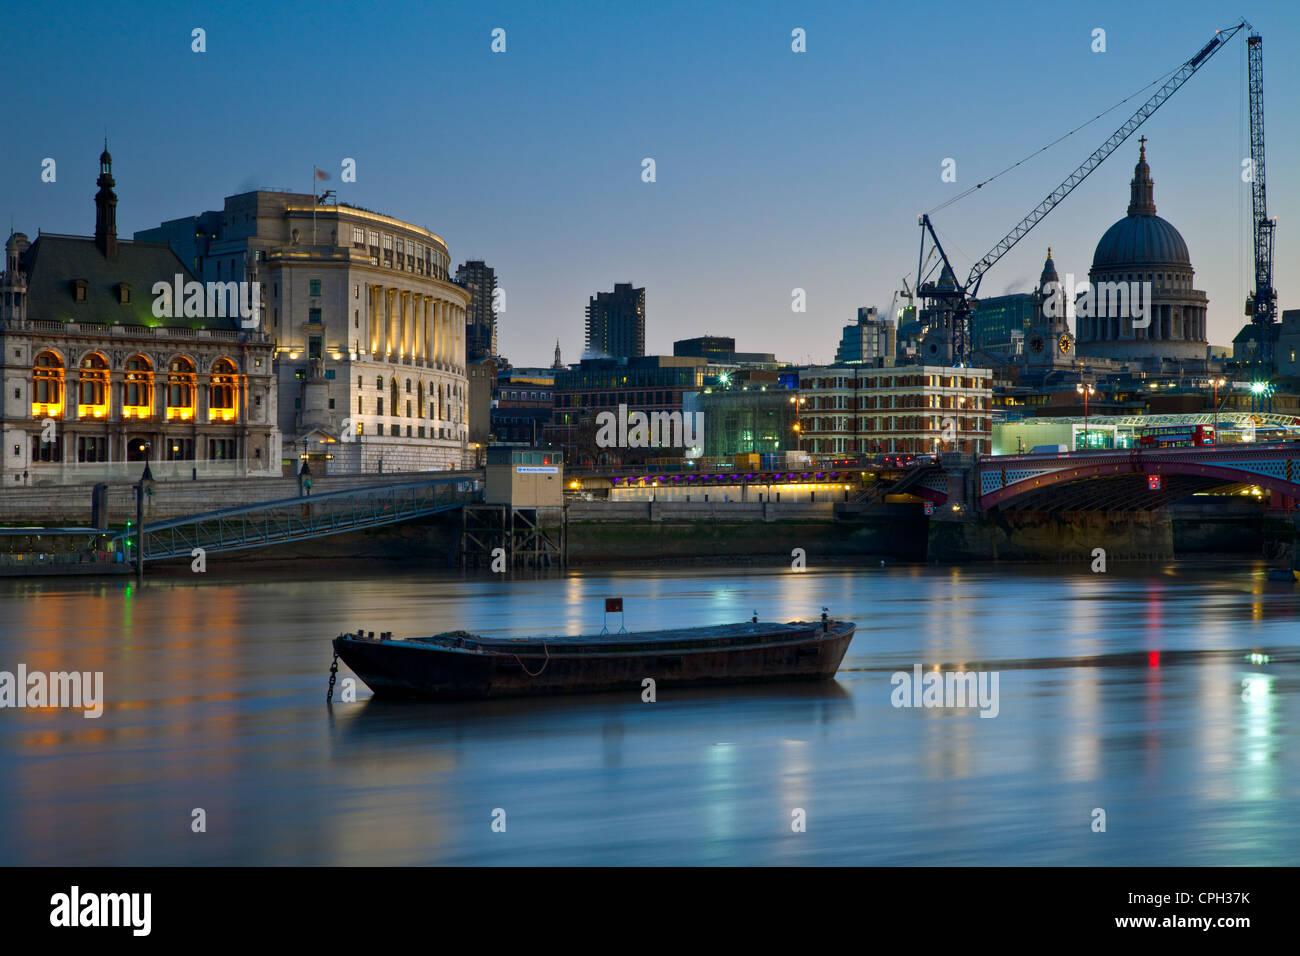 Dawn on the Thames at Blackfriars Bridge, London. - Stock Image